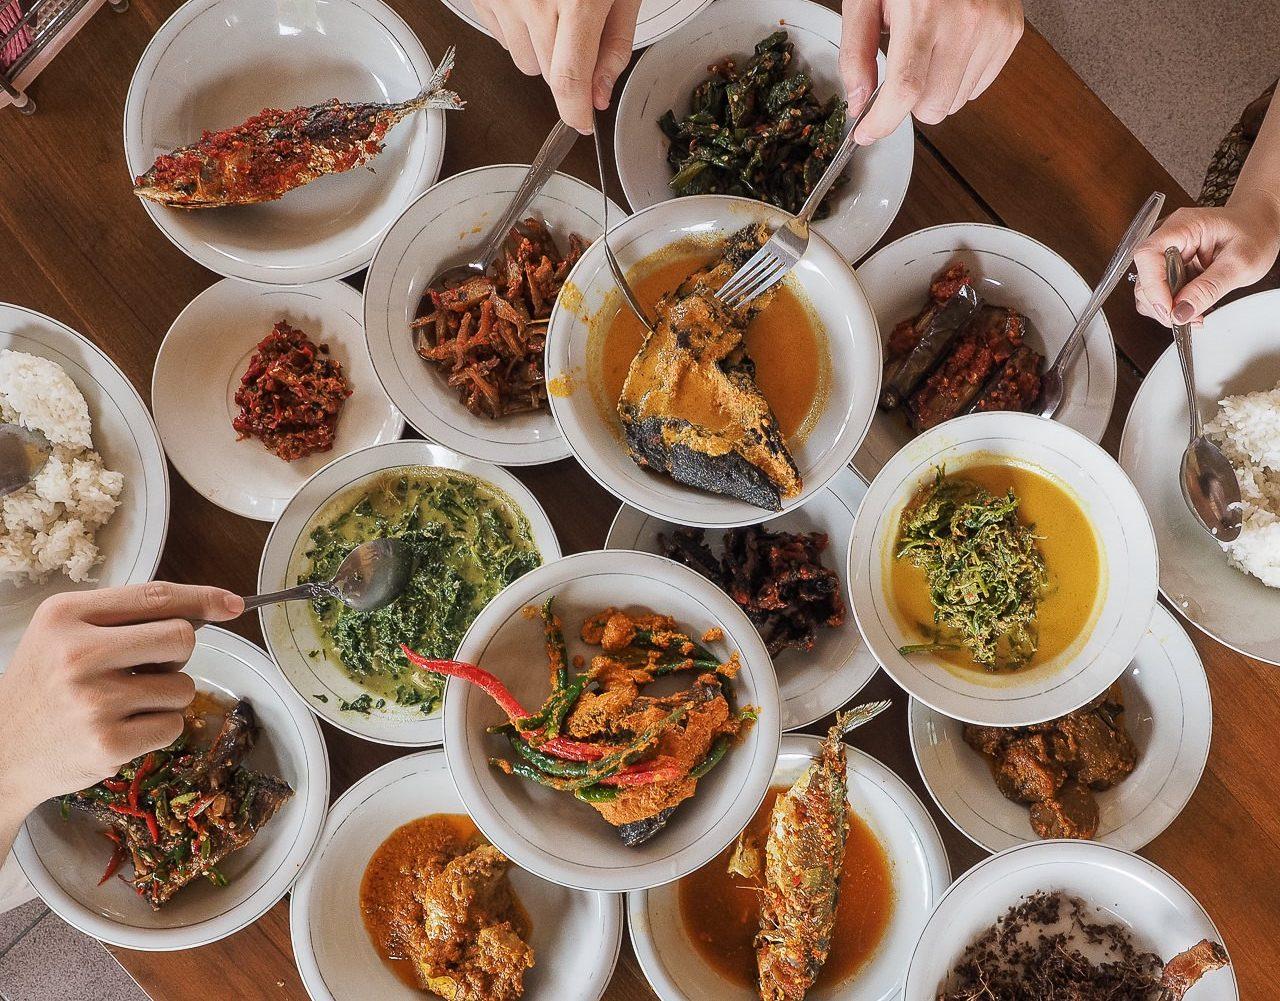 Awas Ngiler 13 Sajian Rumah Makan Padang Ini Wajib Dicoba